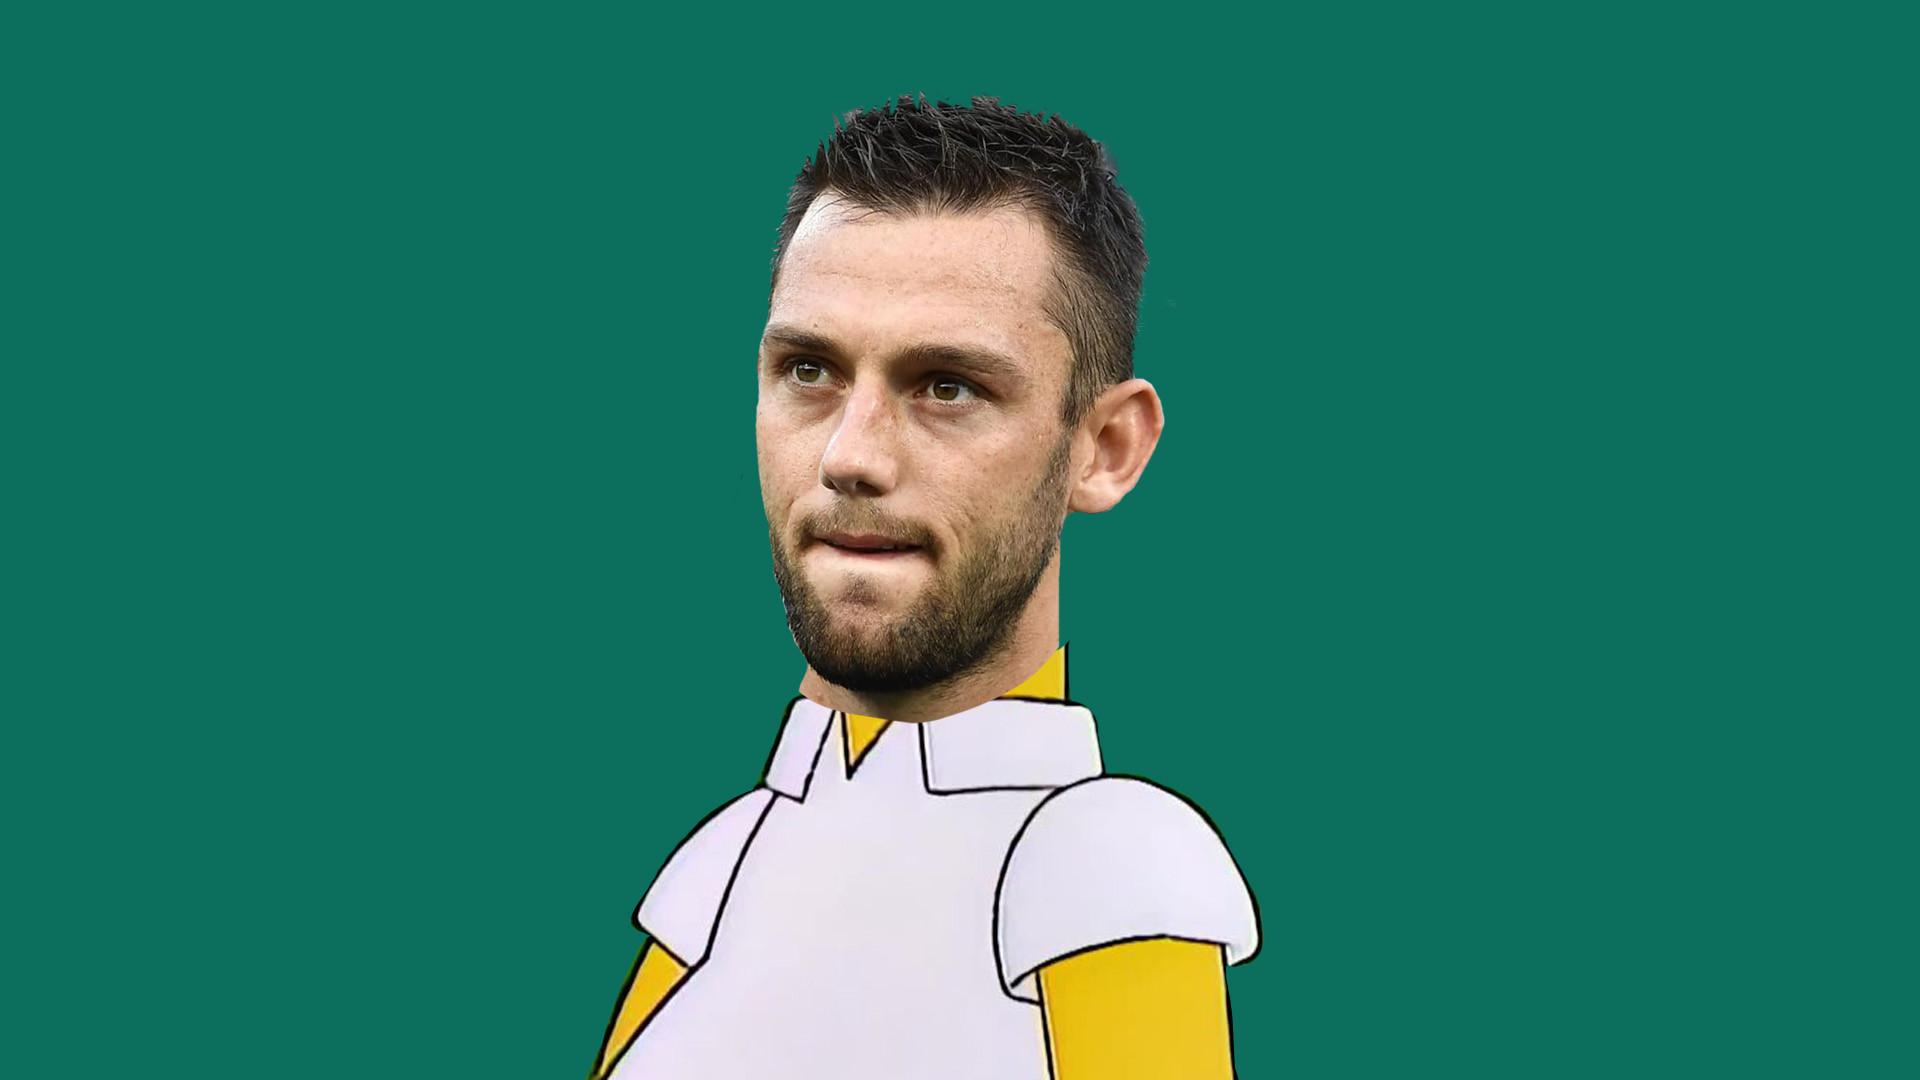 Meme calcio De Vrji